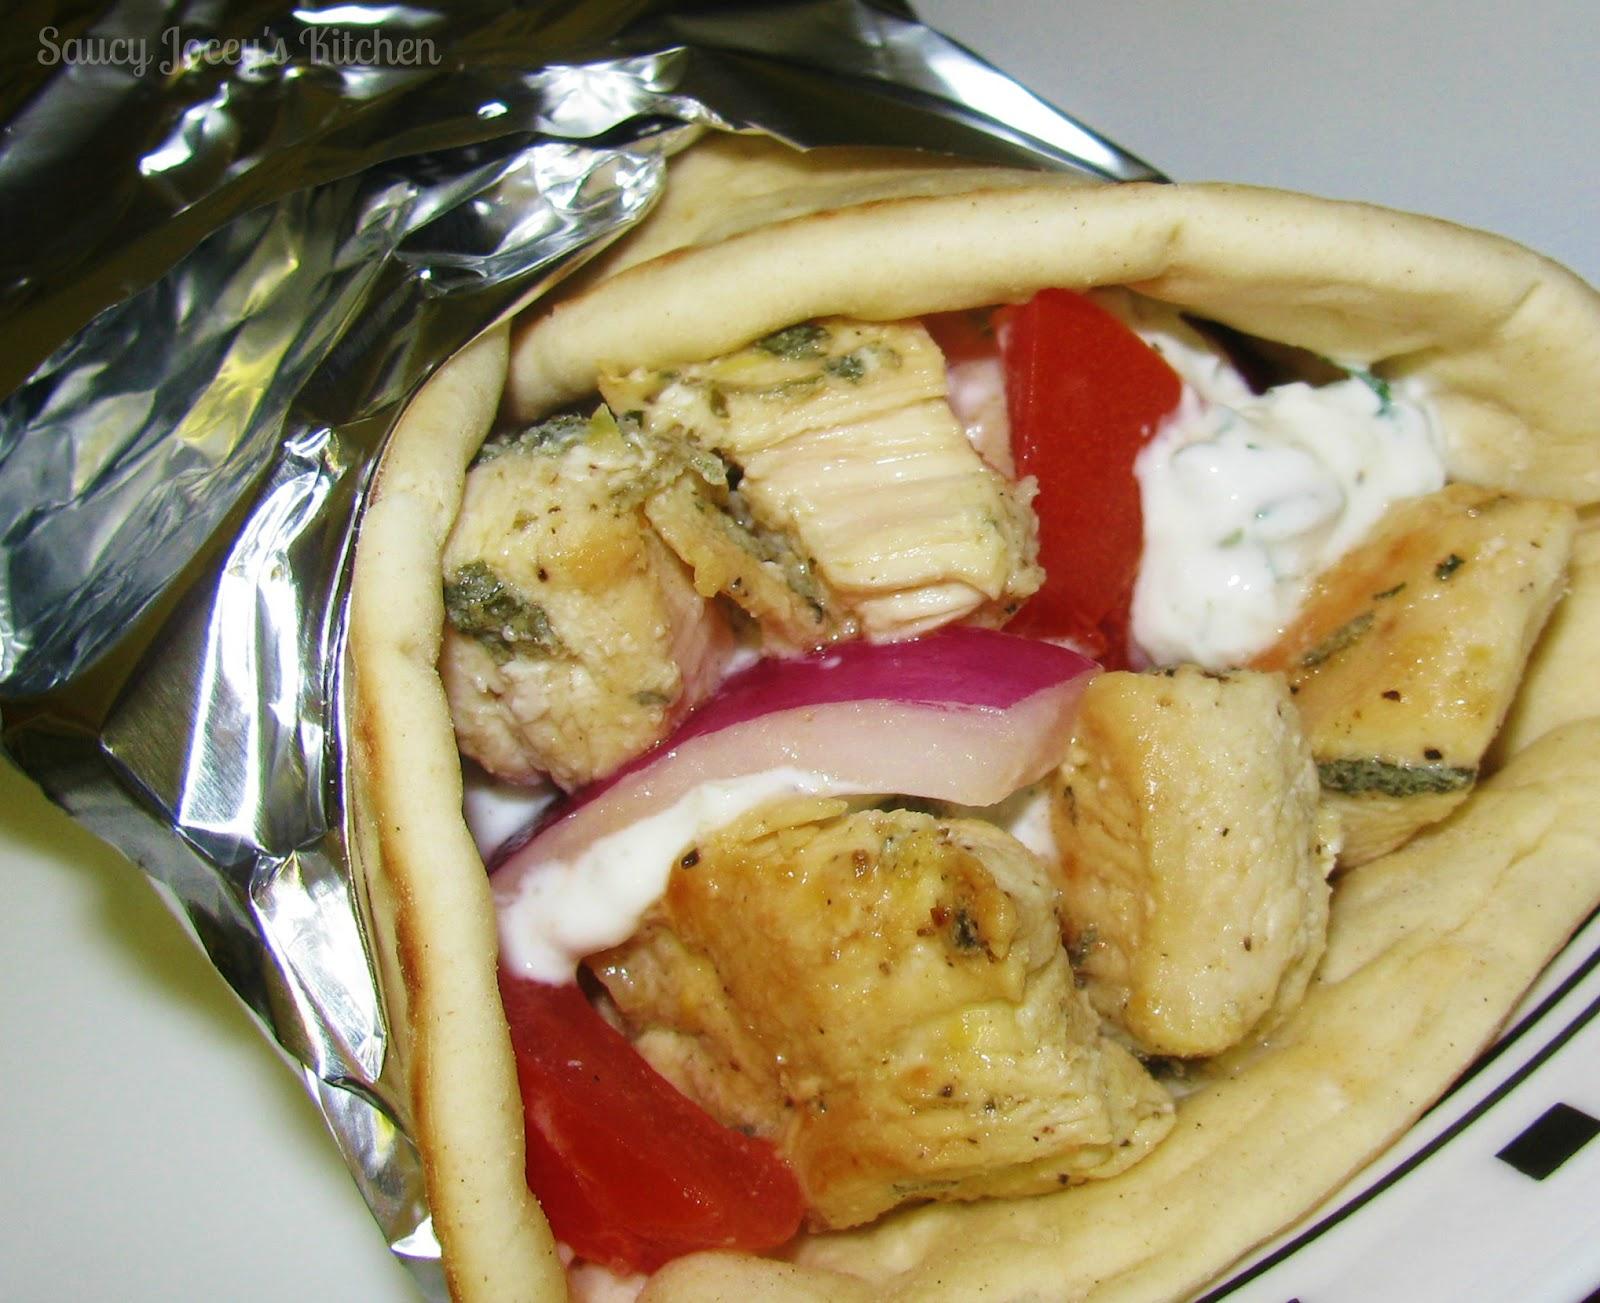 Saucy Jocey's Kitchen: Chicken SouVlaki